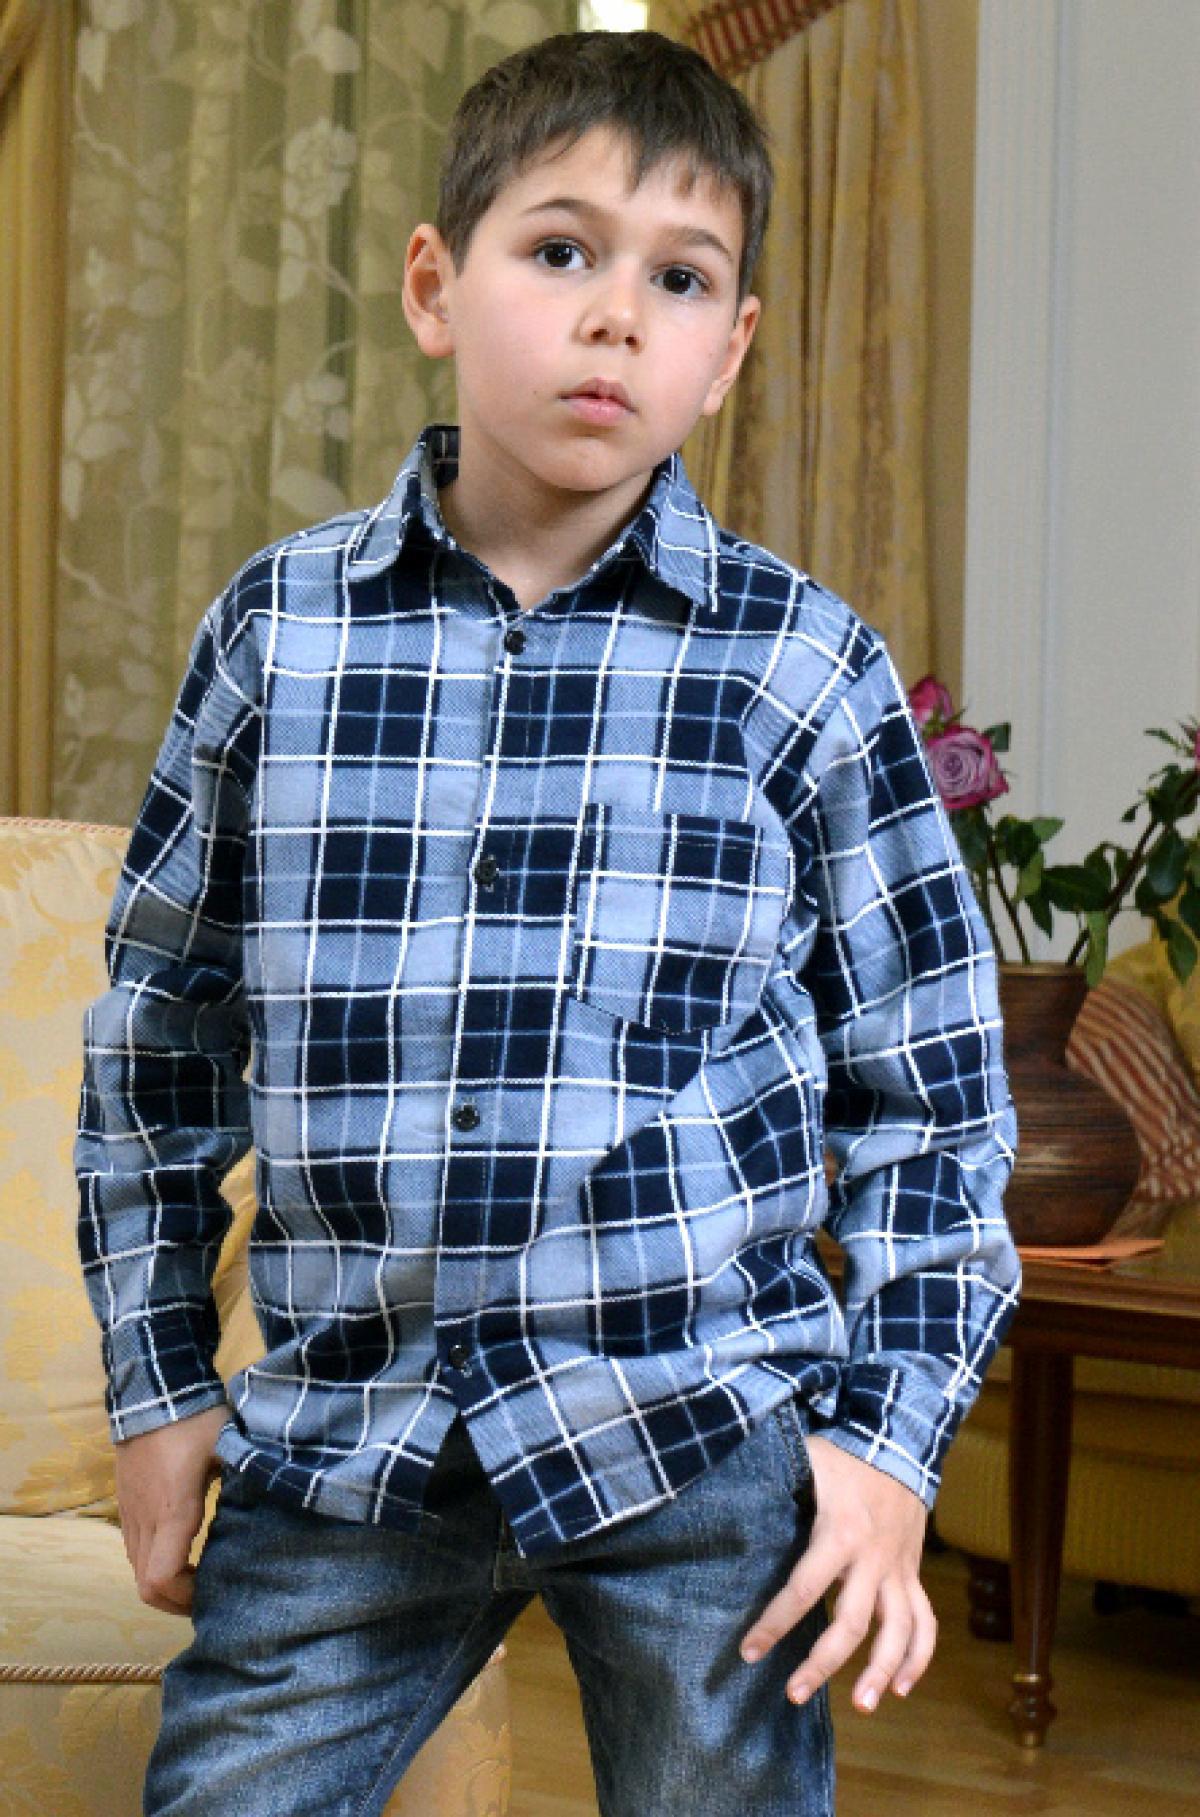 Дет. рубашка арт. 18-0091 р. 32Толстовки, джемпера и рубашки<br><br><br>Тип: Дет. рубашка<br>Размер: 32<br>Материал: Фланель